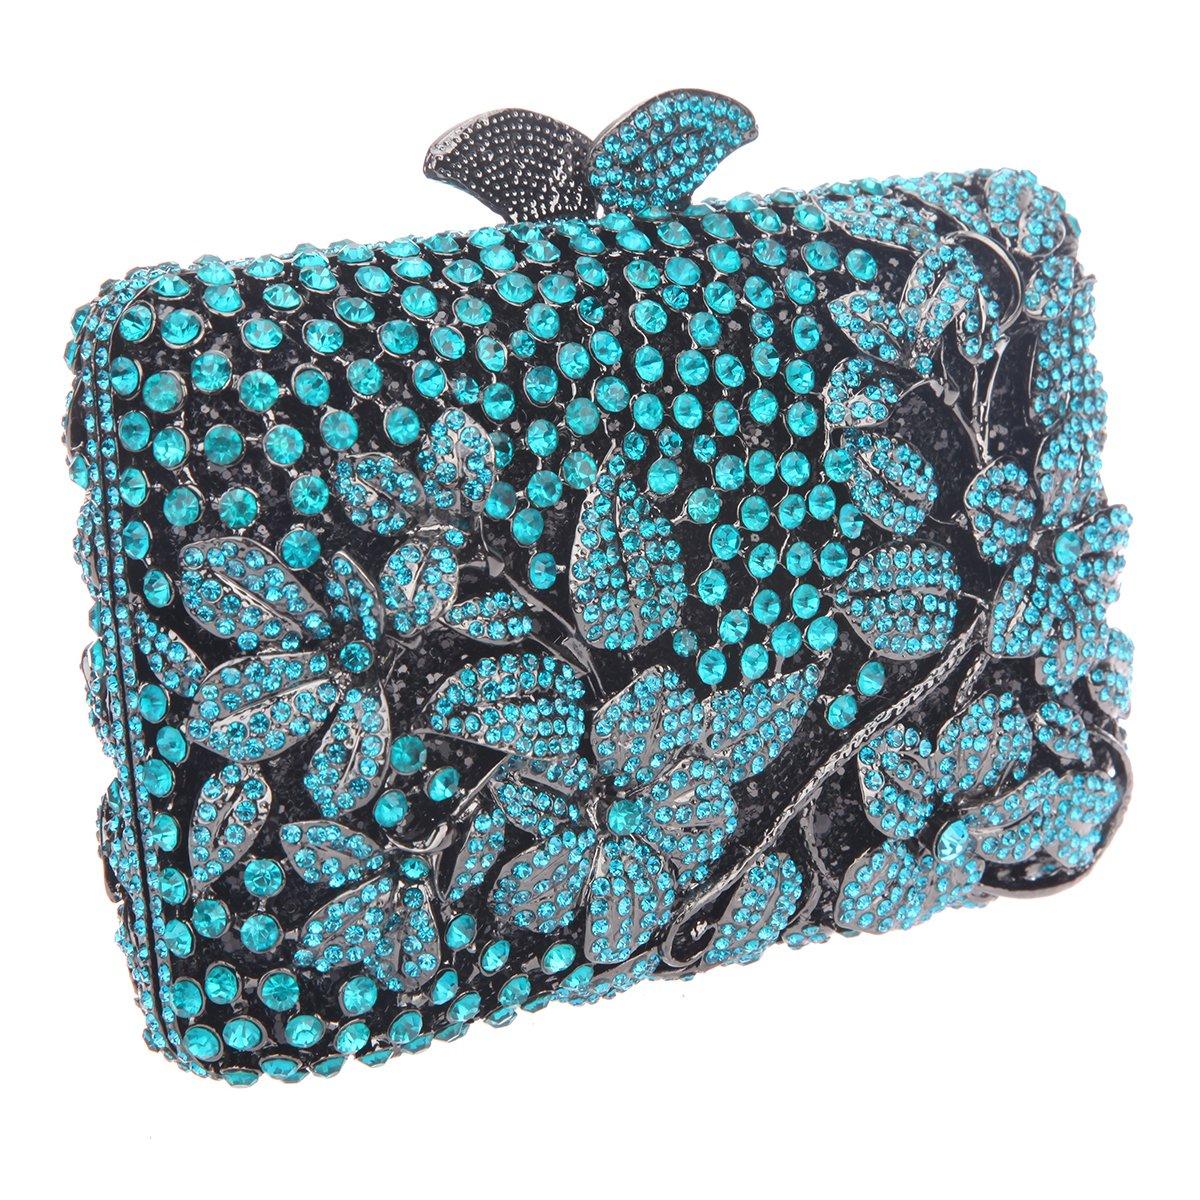 Bonjanvye Flower Kisslock Purses with Crystal Rhinestones Evening Clutch Bag Blue: Amazon.es: Equipaje